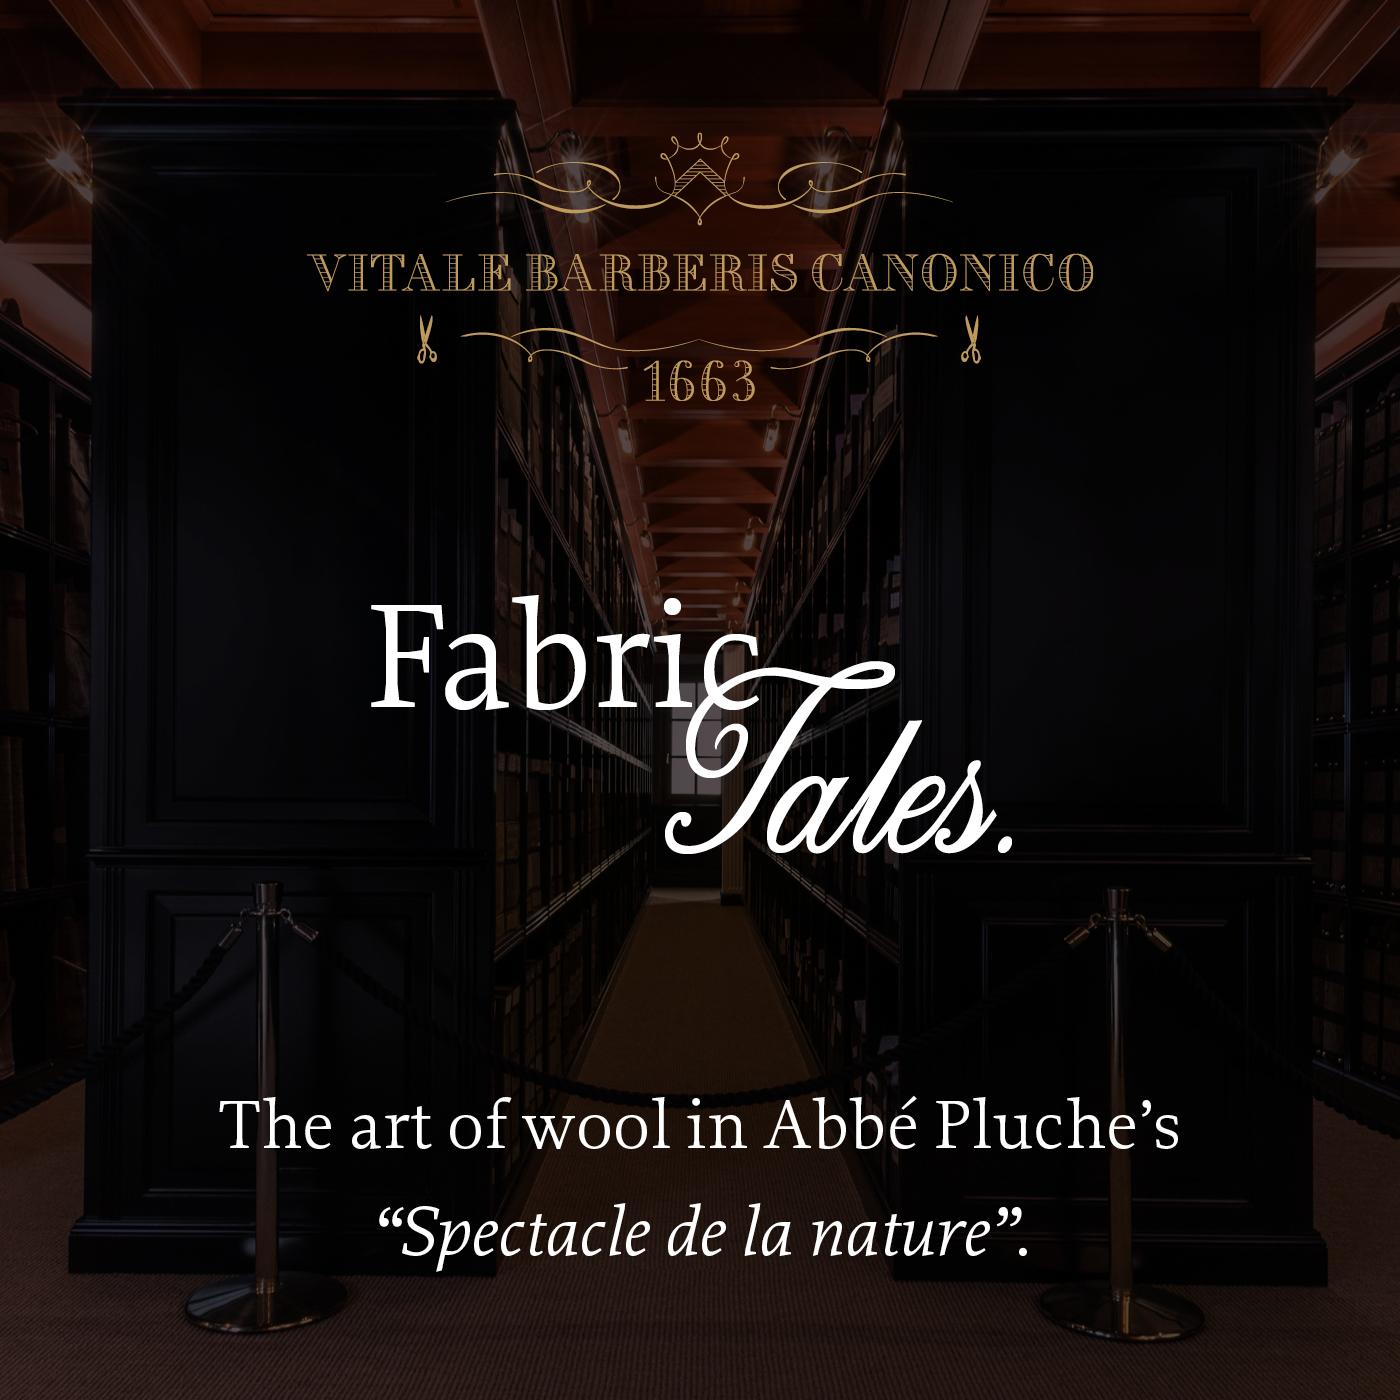 The art of wool in Abbé Pluche's